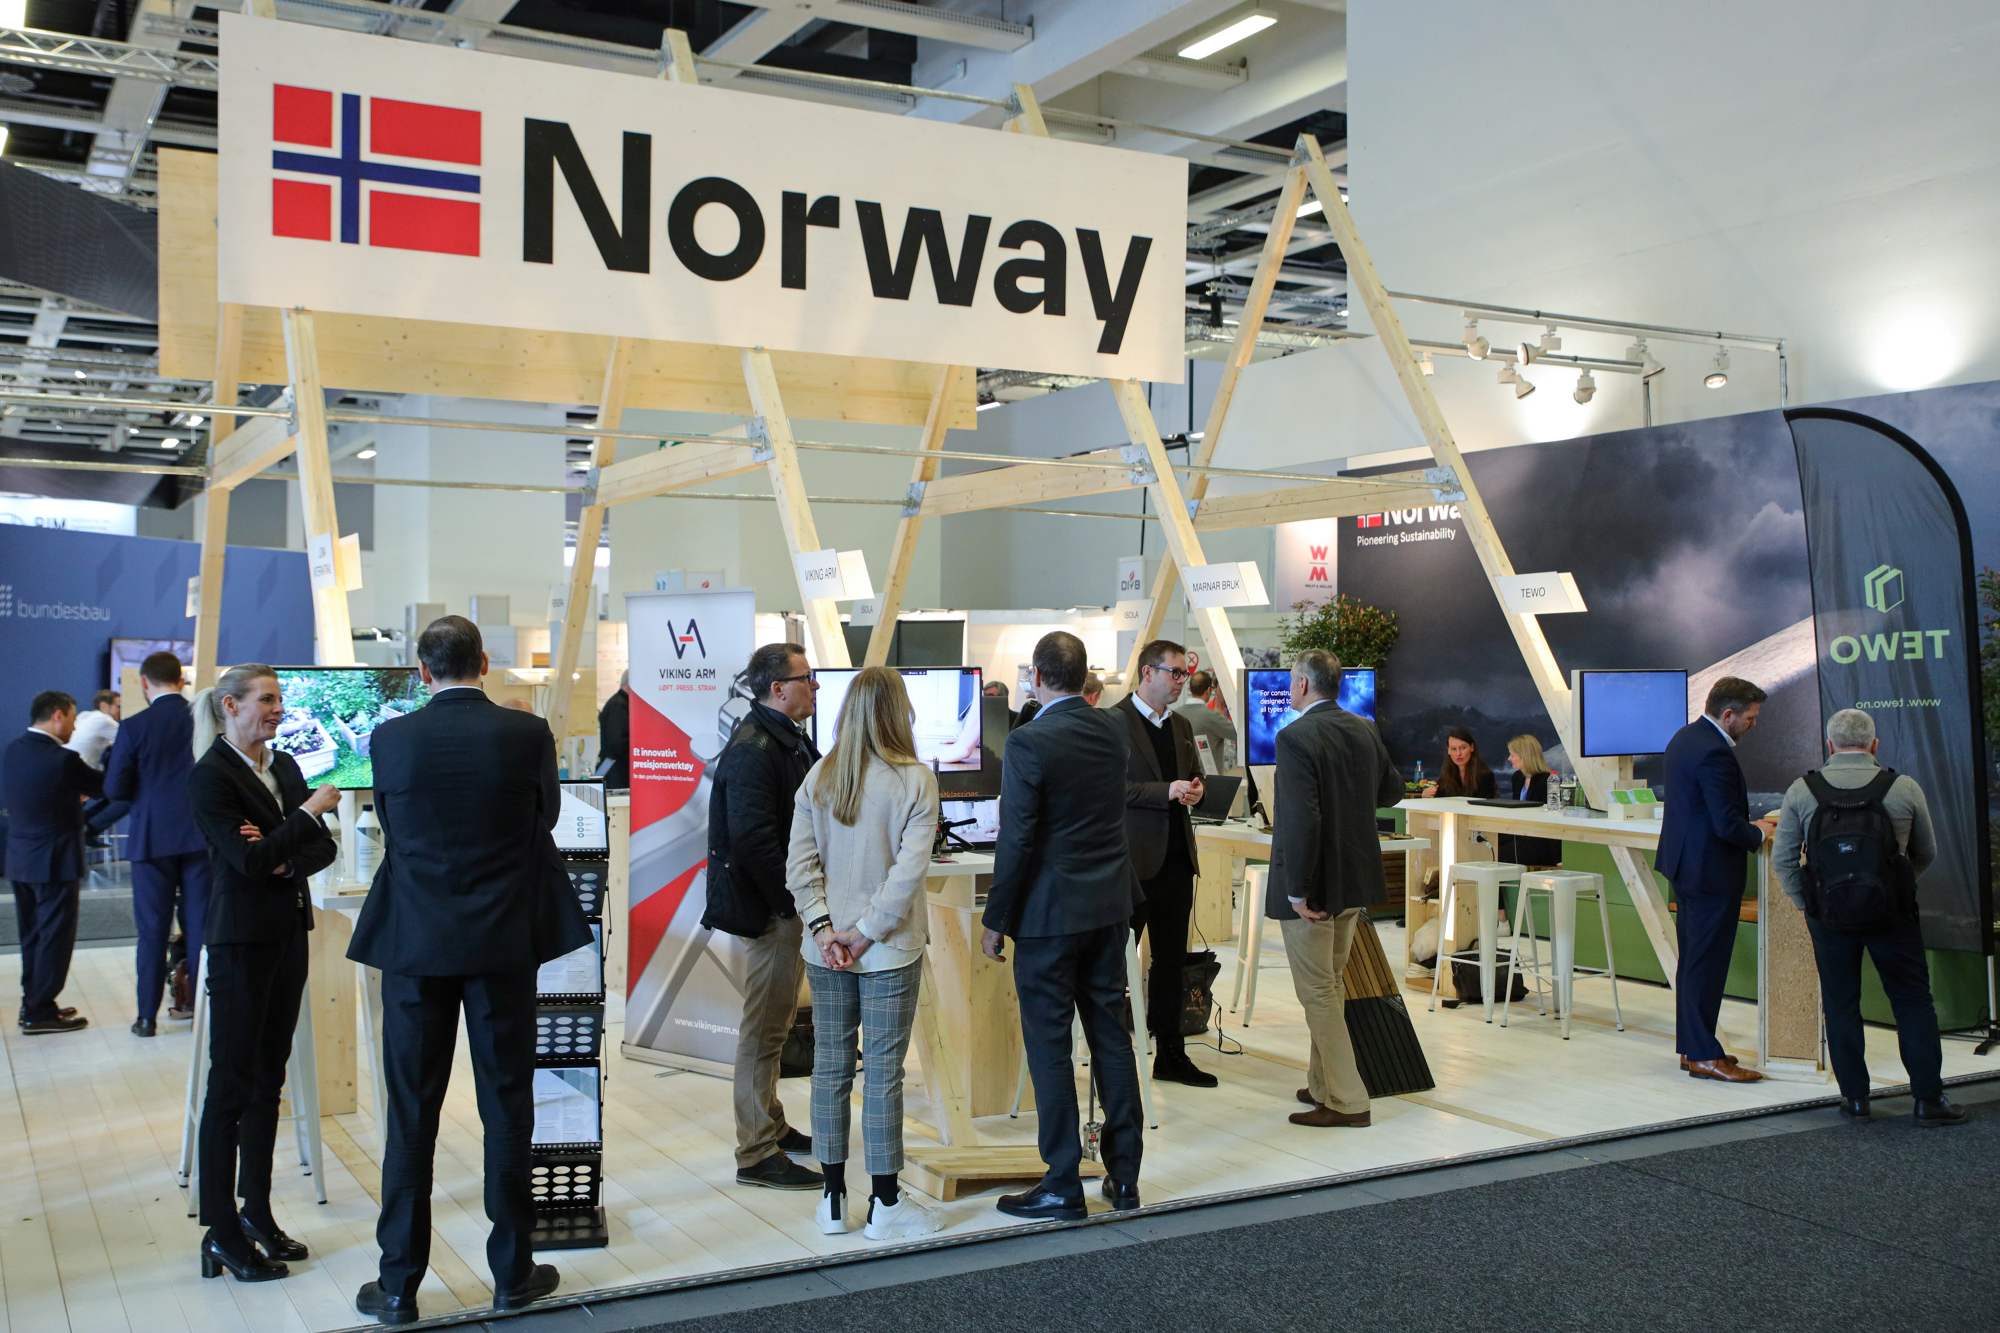 bautec 2020 Partnerland Norwegen *** Local Caption *** Partner Country Norway SALP Construction Deutschland komsol Controll innerseal